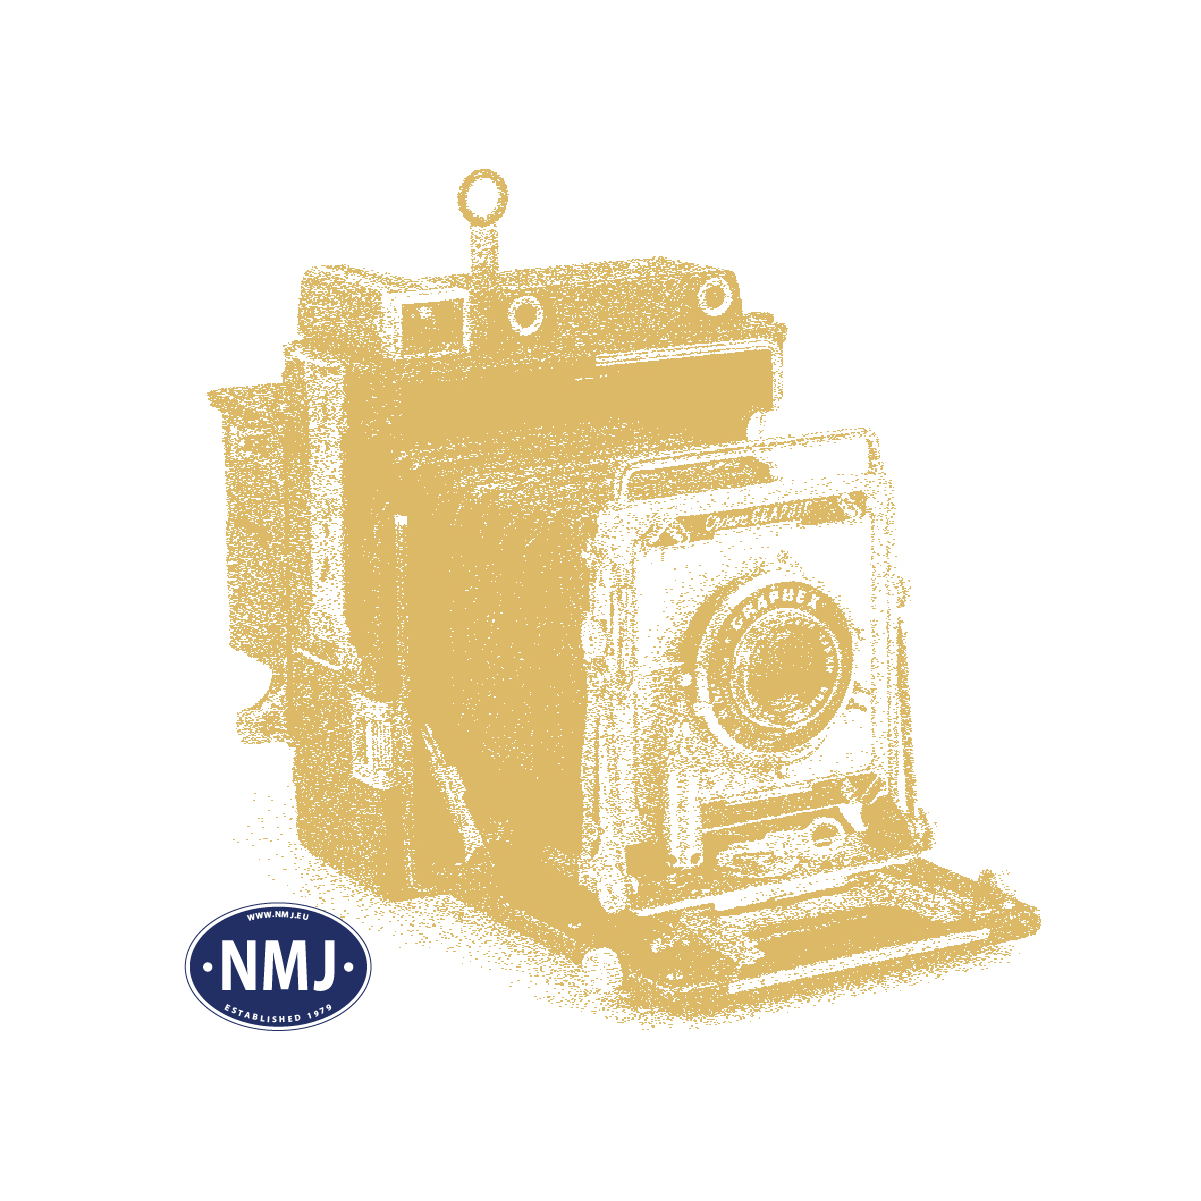 LIL136100 - P & T Skinnejusteringsmaskin DB, Motorisert, DCC Digital